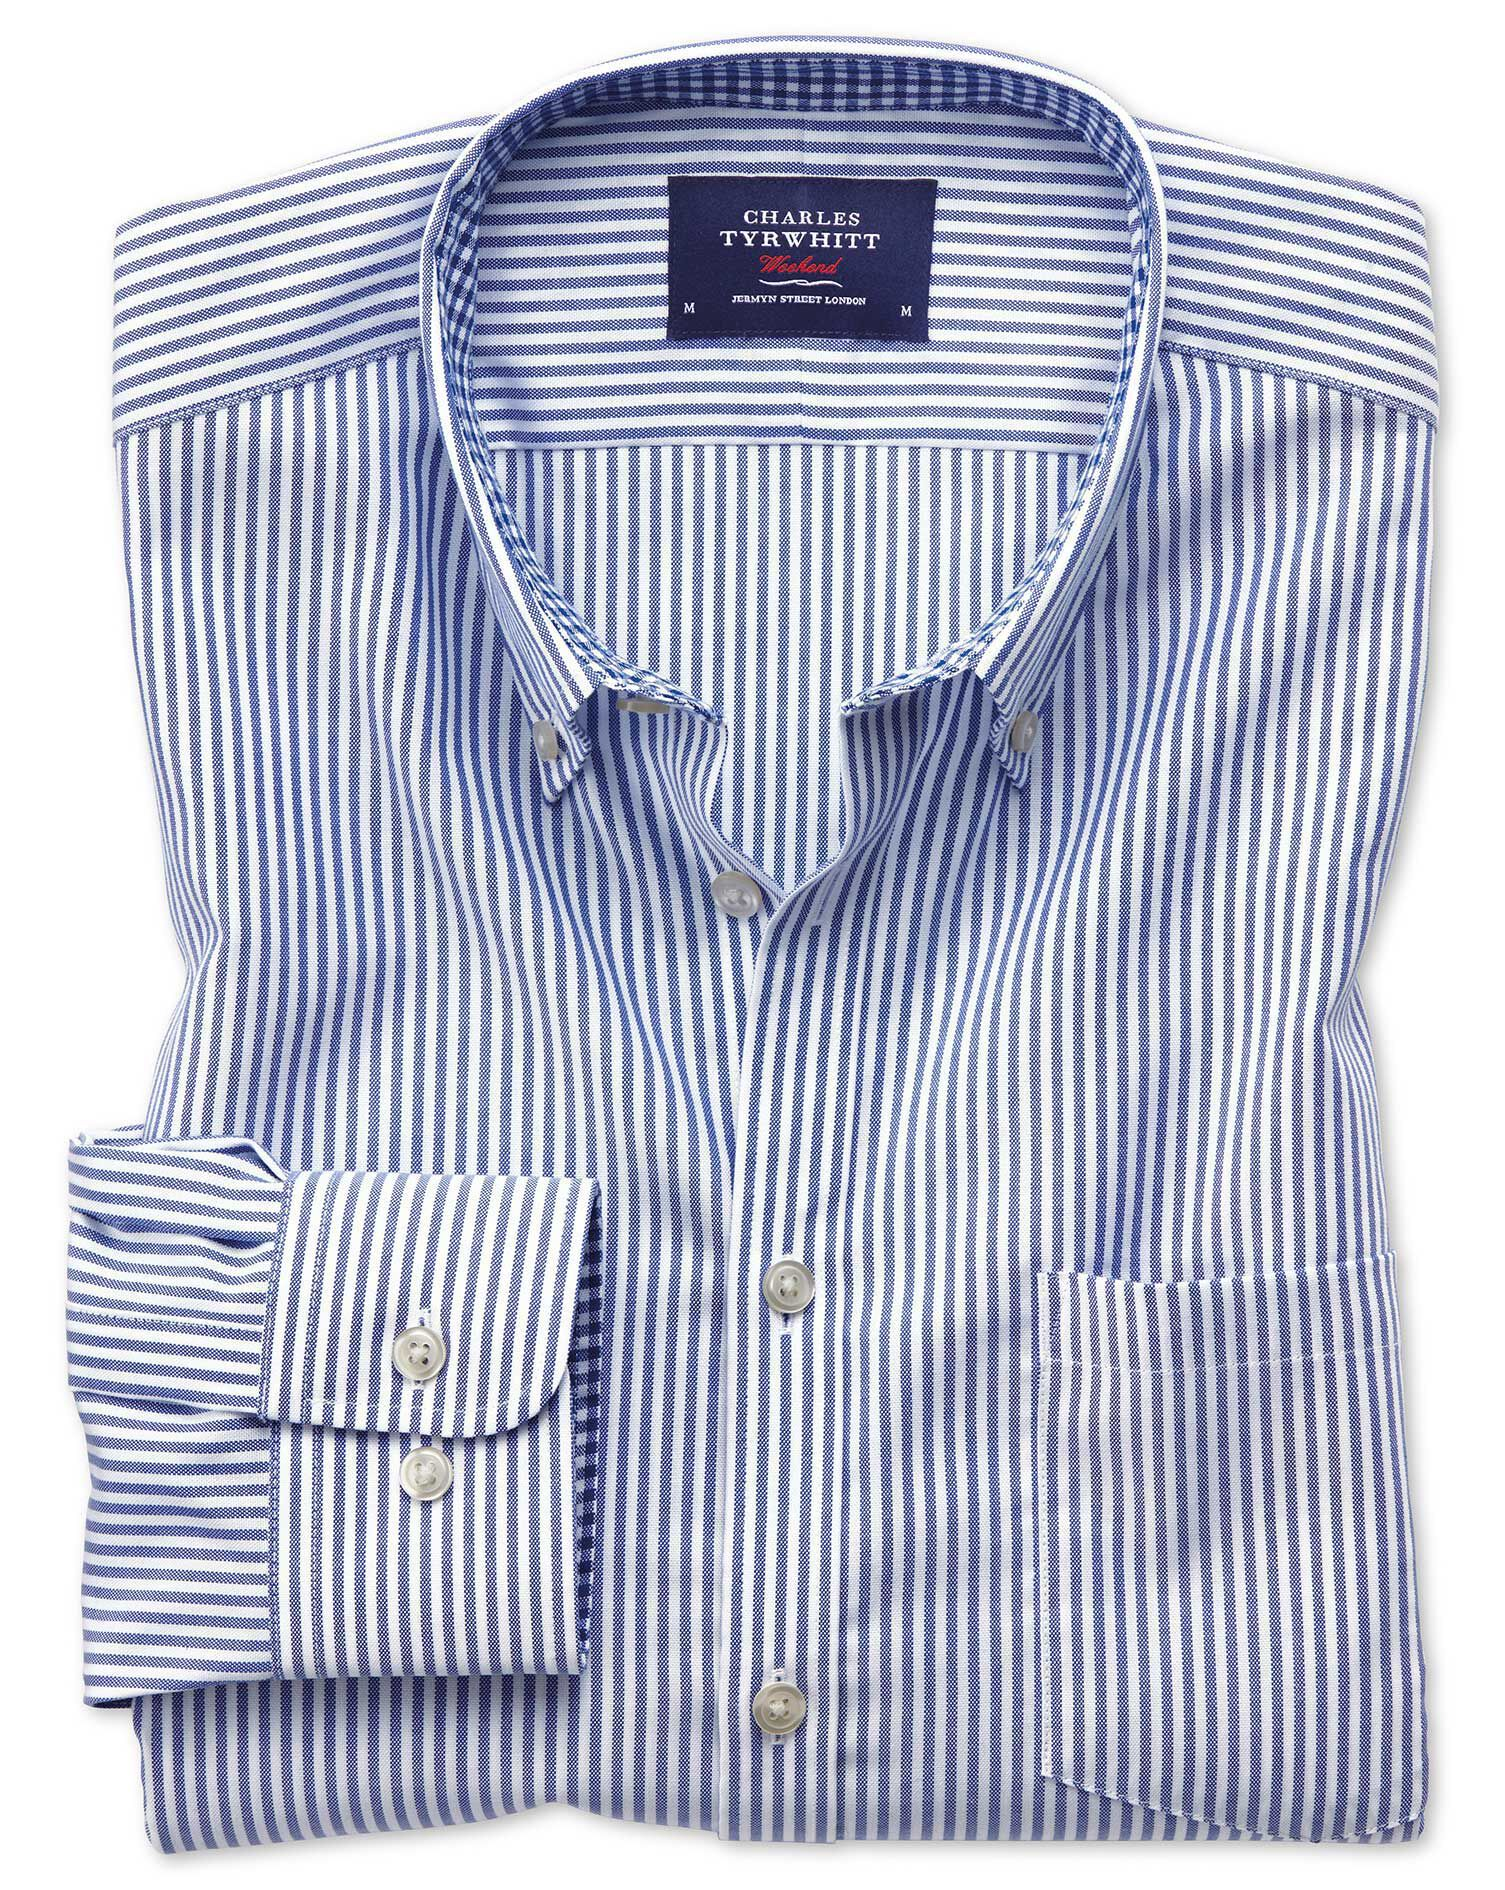 Classic Fit Button-Down Non-Iron Oxford Bengal Stripe Royal Blue Cotton Shirt Single Cuff Size Large